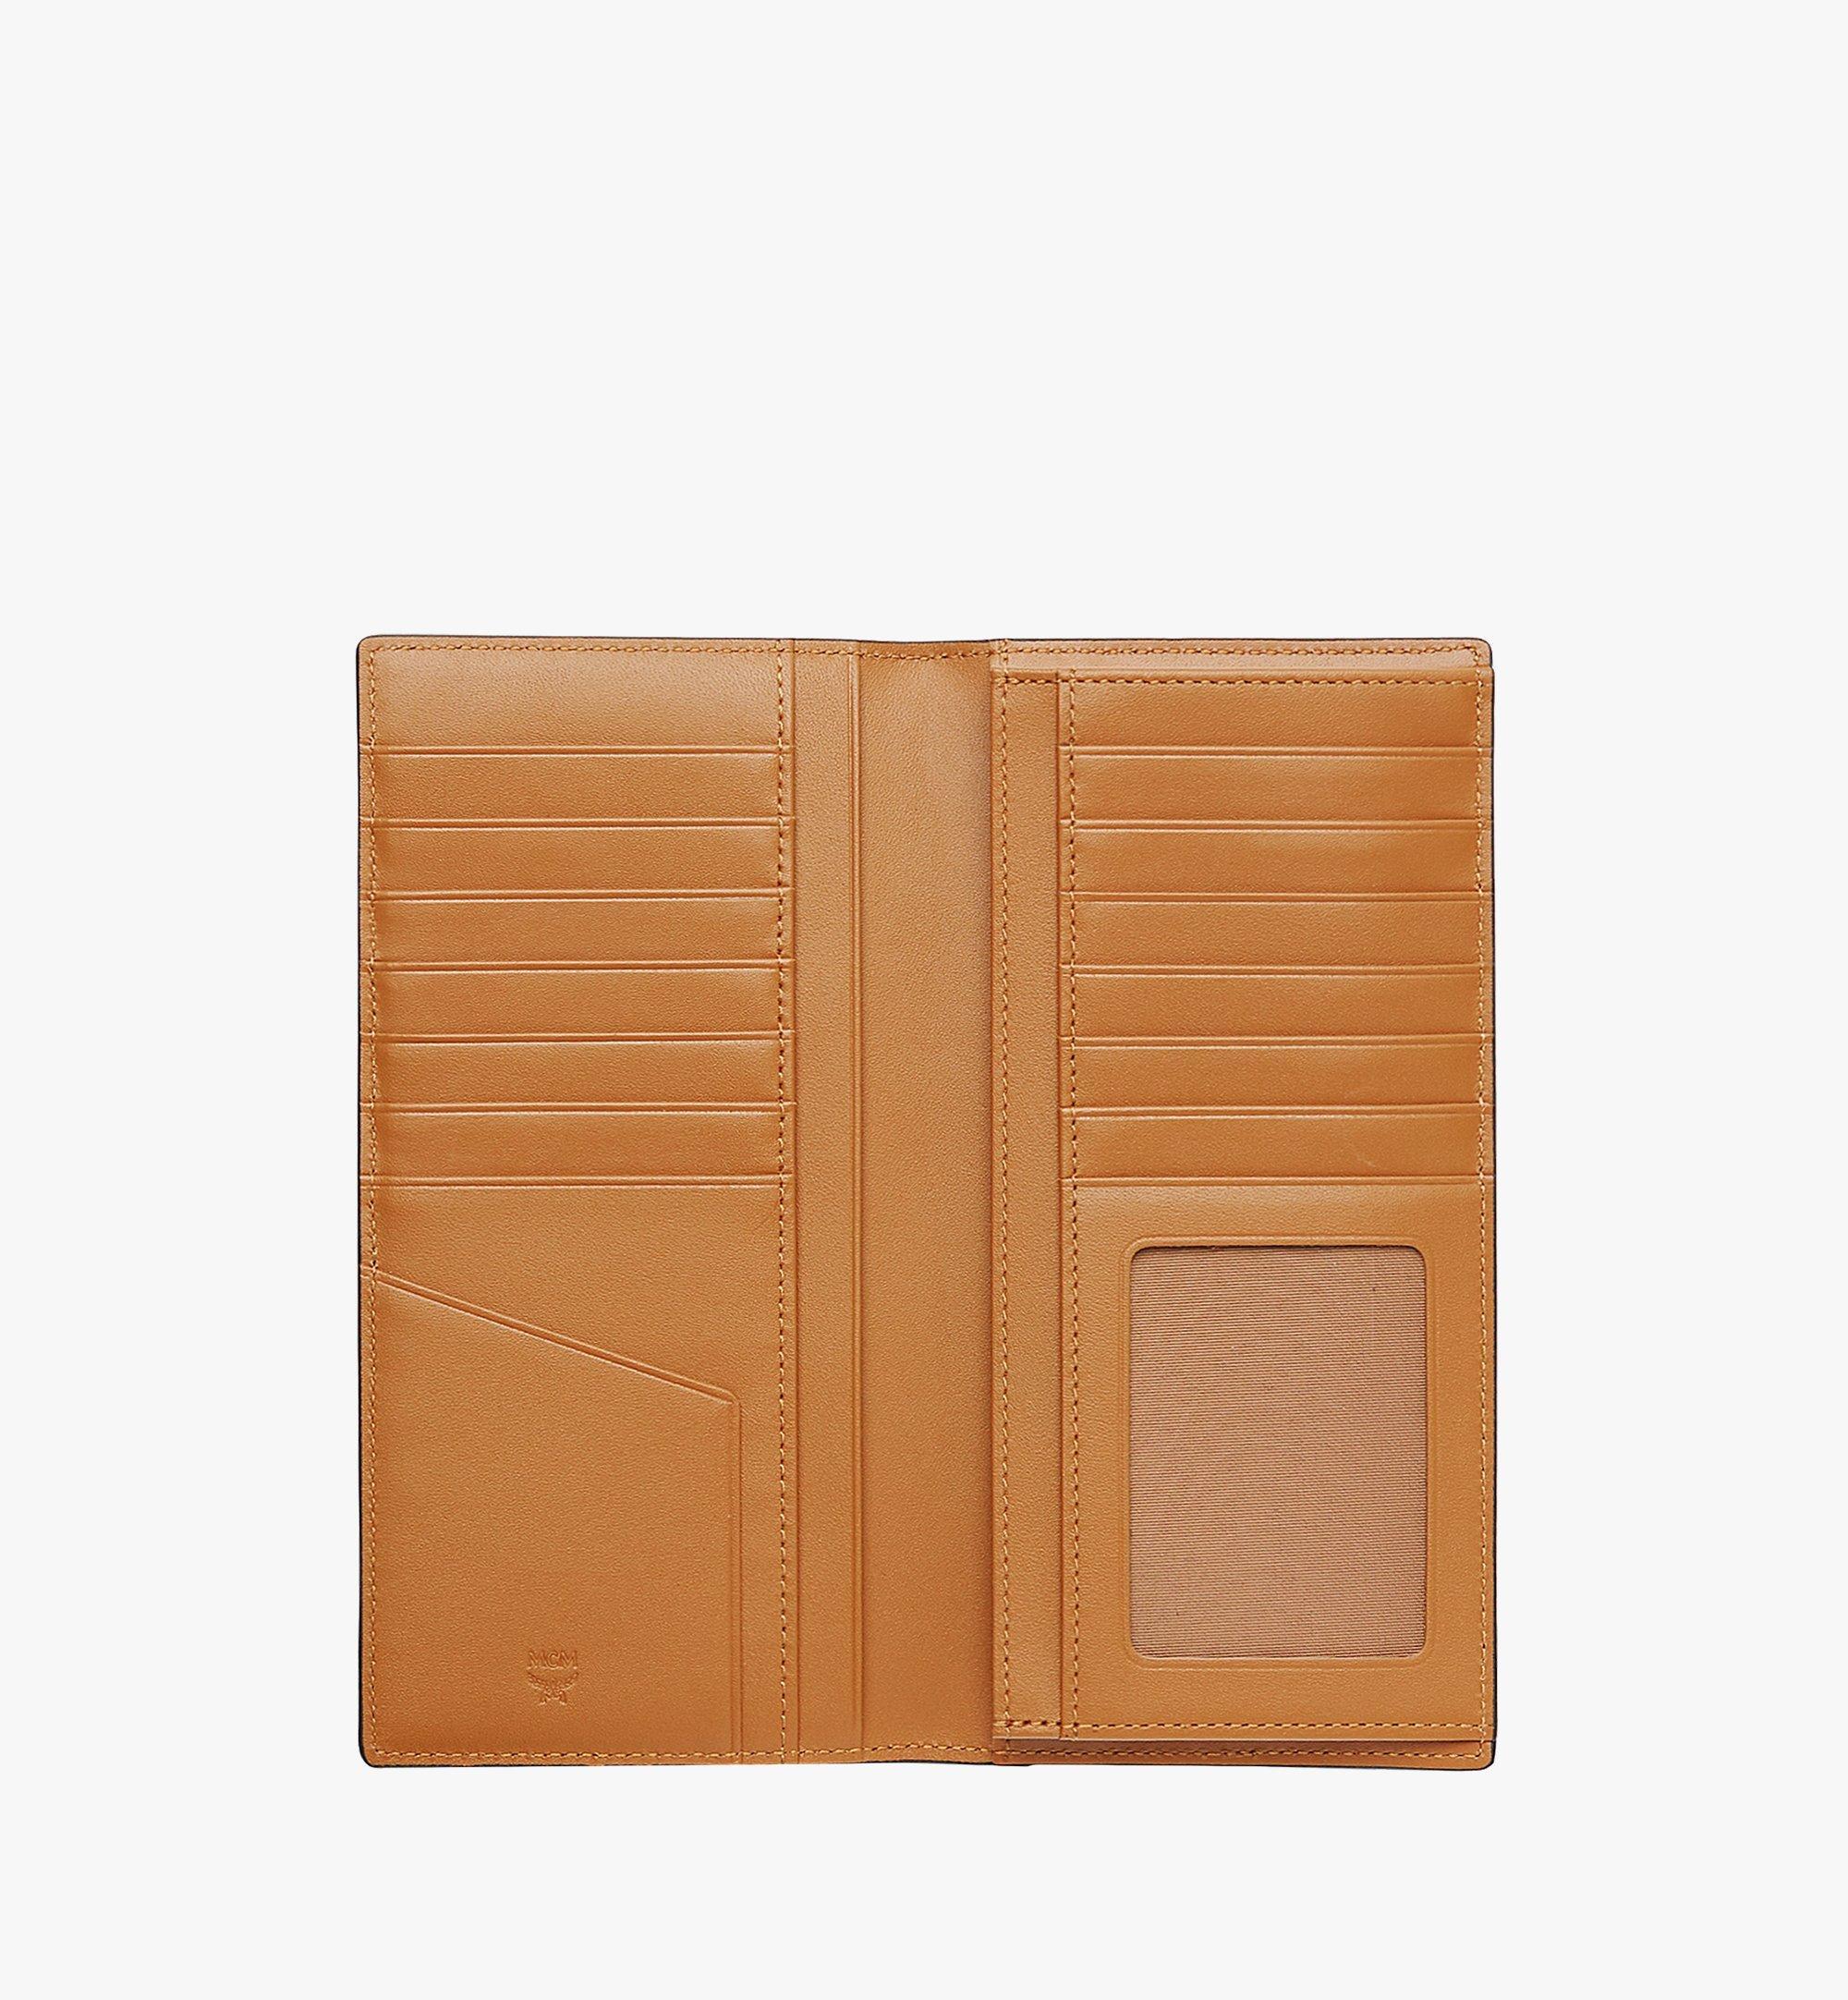 MCM Continental Wallet in Visetos Original Cognac MXLAAVI02CO001 Alternate View 3